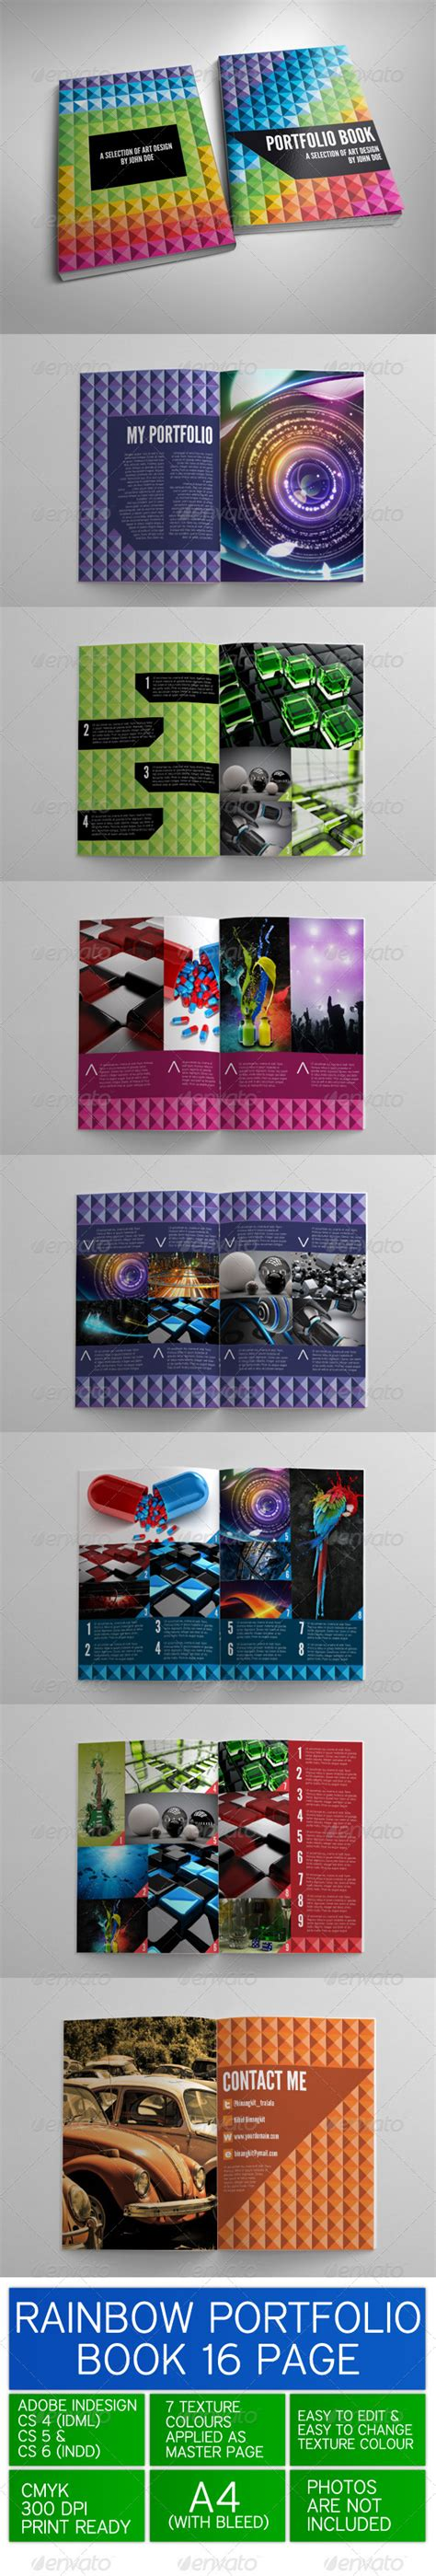 layout majalah musik contoh gambar brosur konser musik 187 tinkytyler org stock